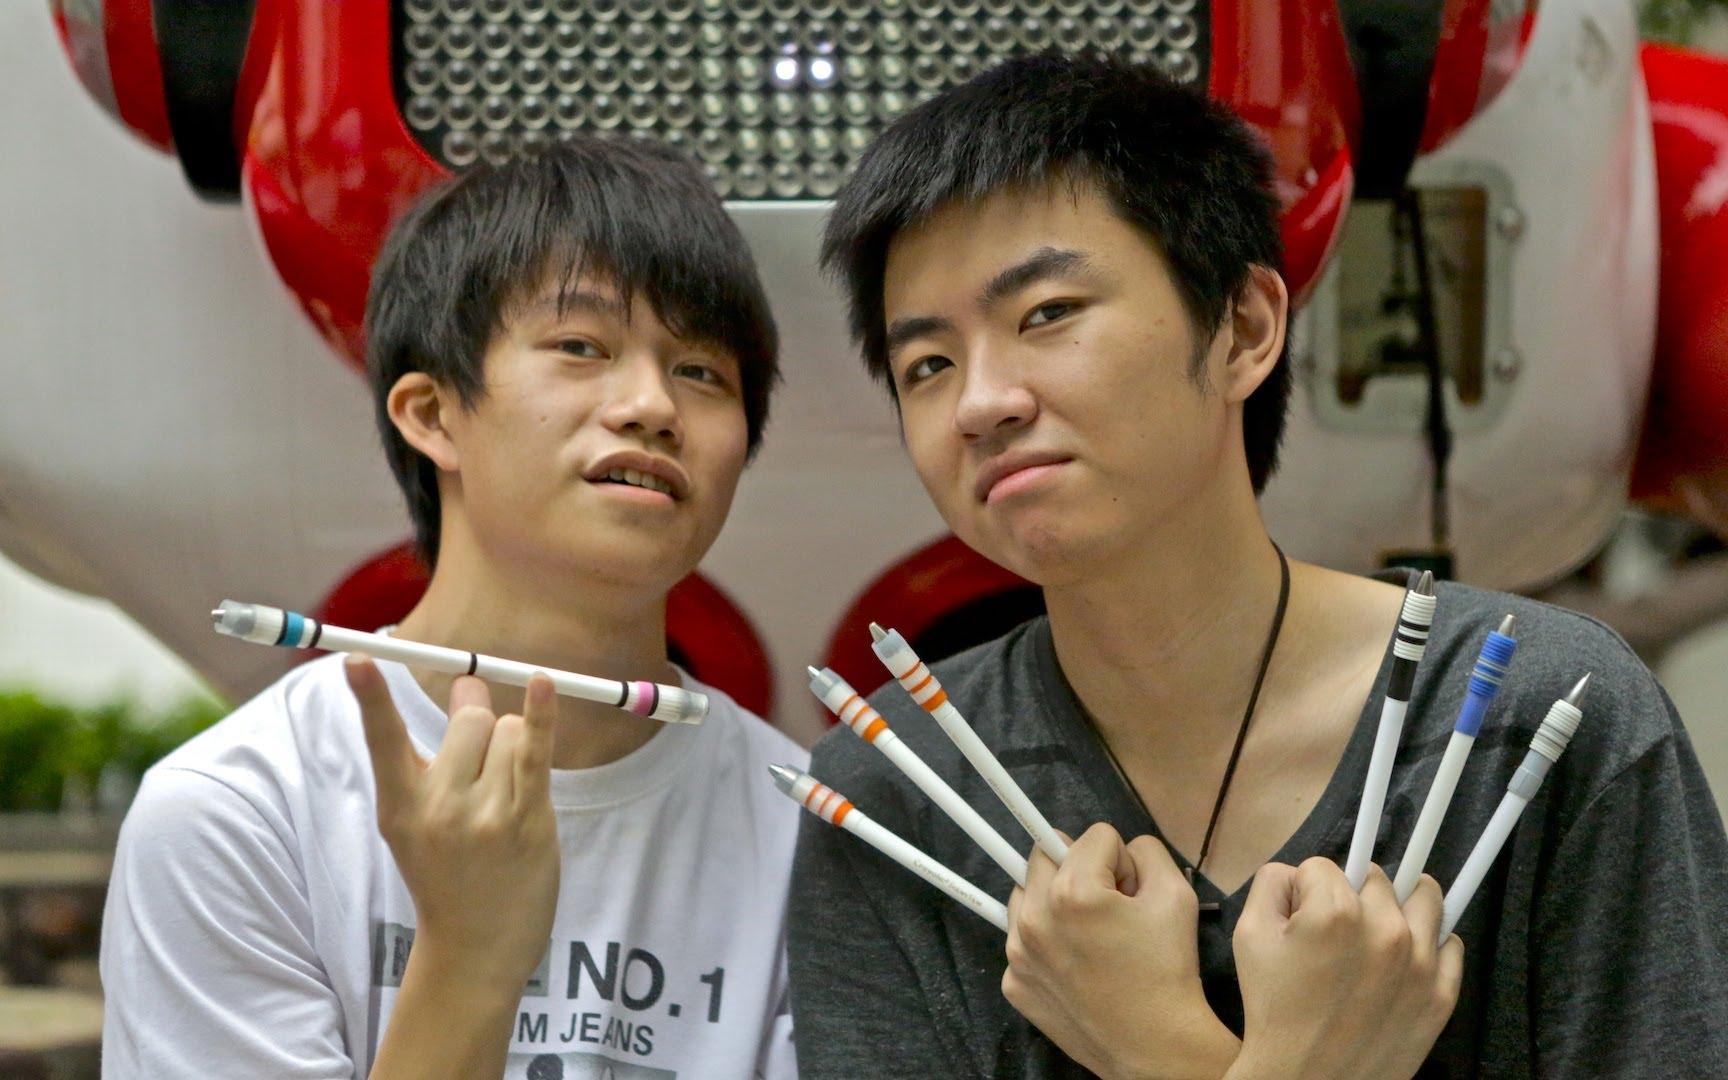 Des doigts et des crayons